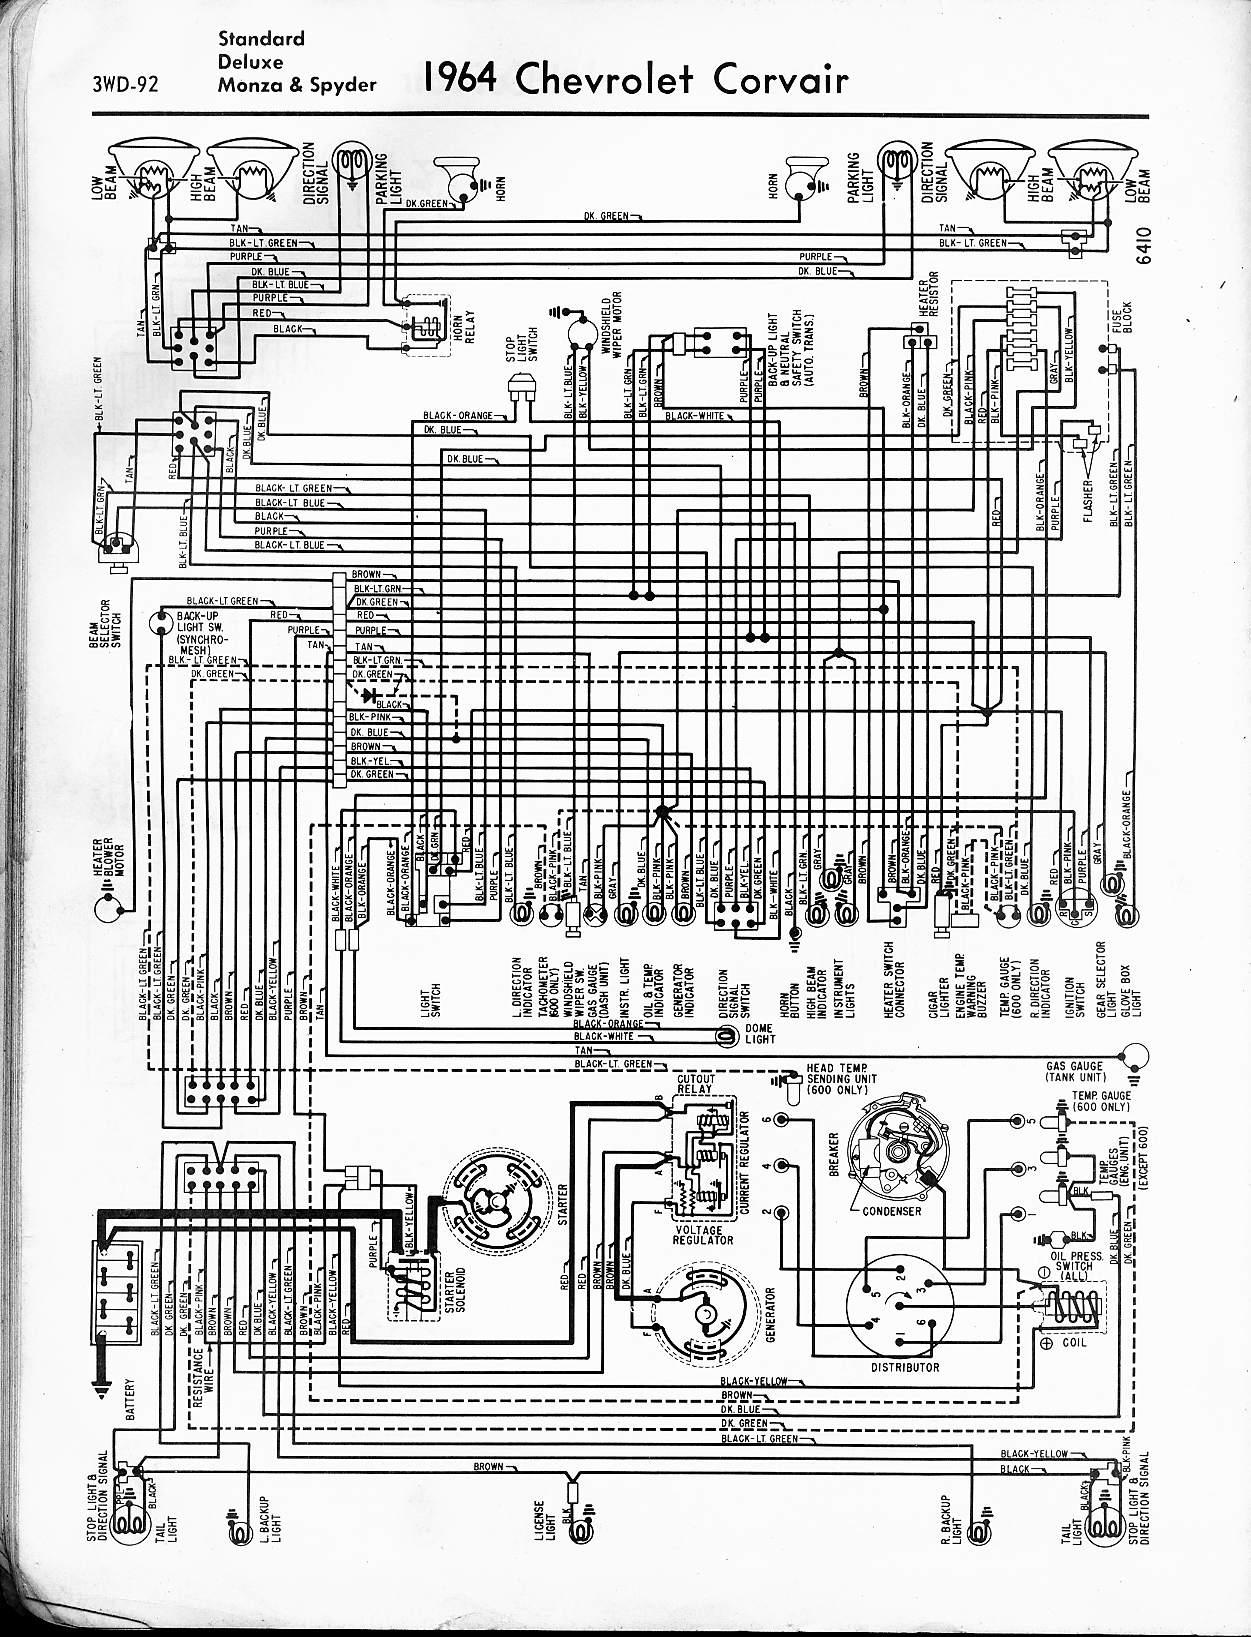 Amazing 1964 Chevelle Wiring Diagram Wiring Diagram Database Wiring Cloud Icalpermsplehendilmohammedshrineorg